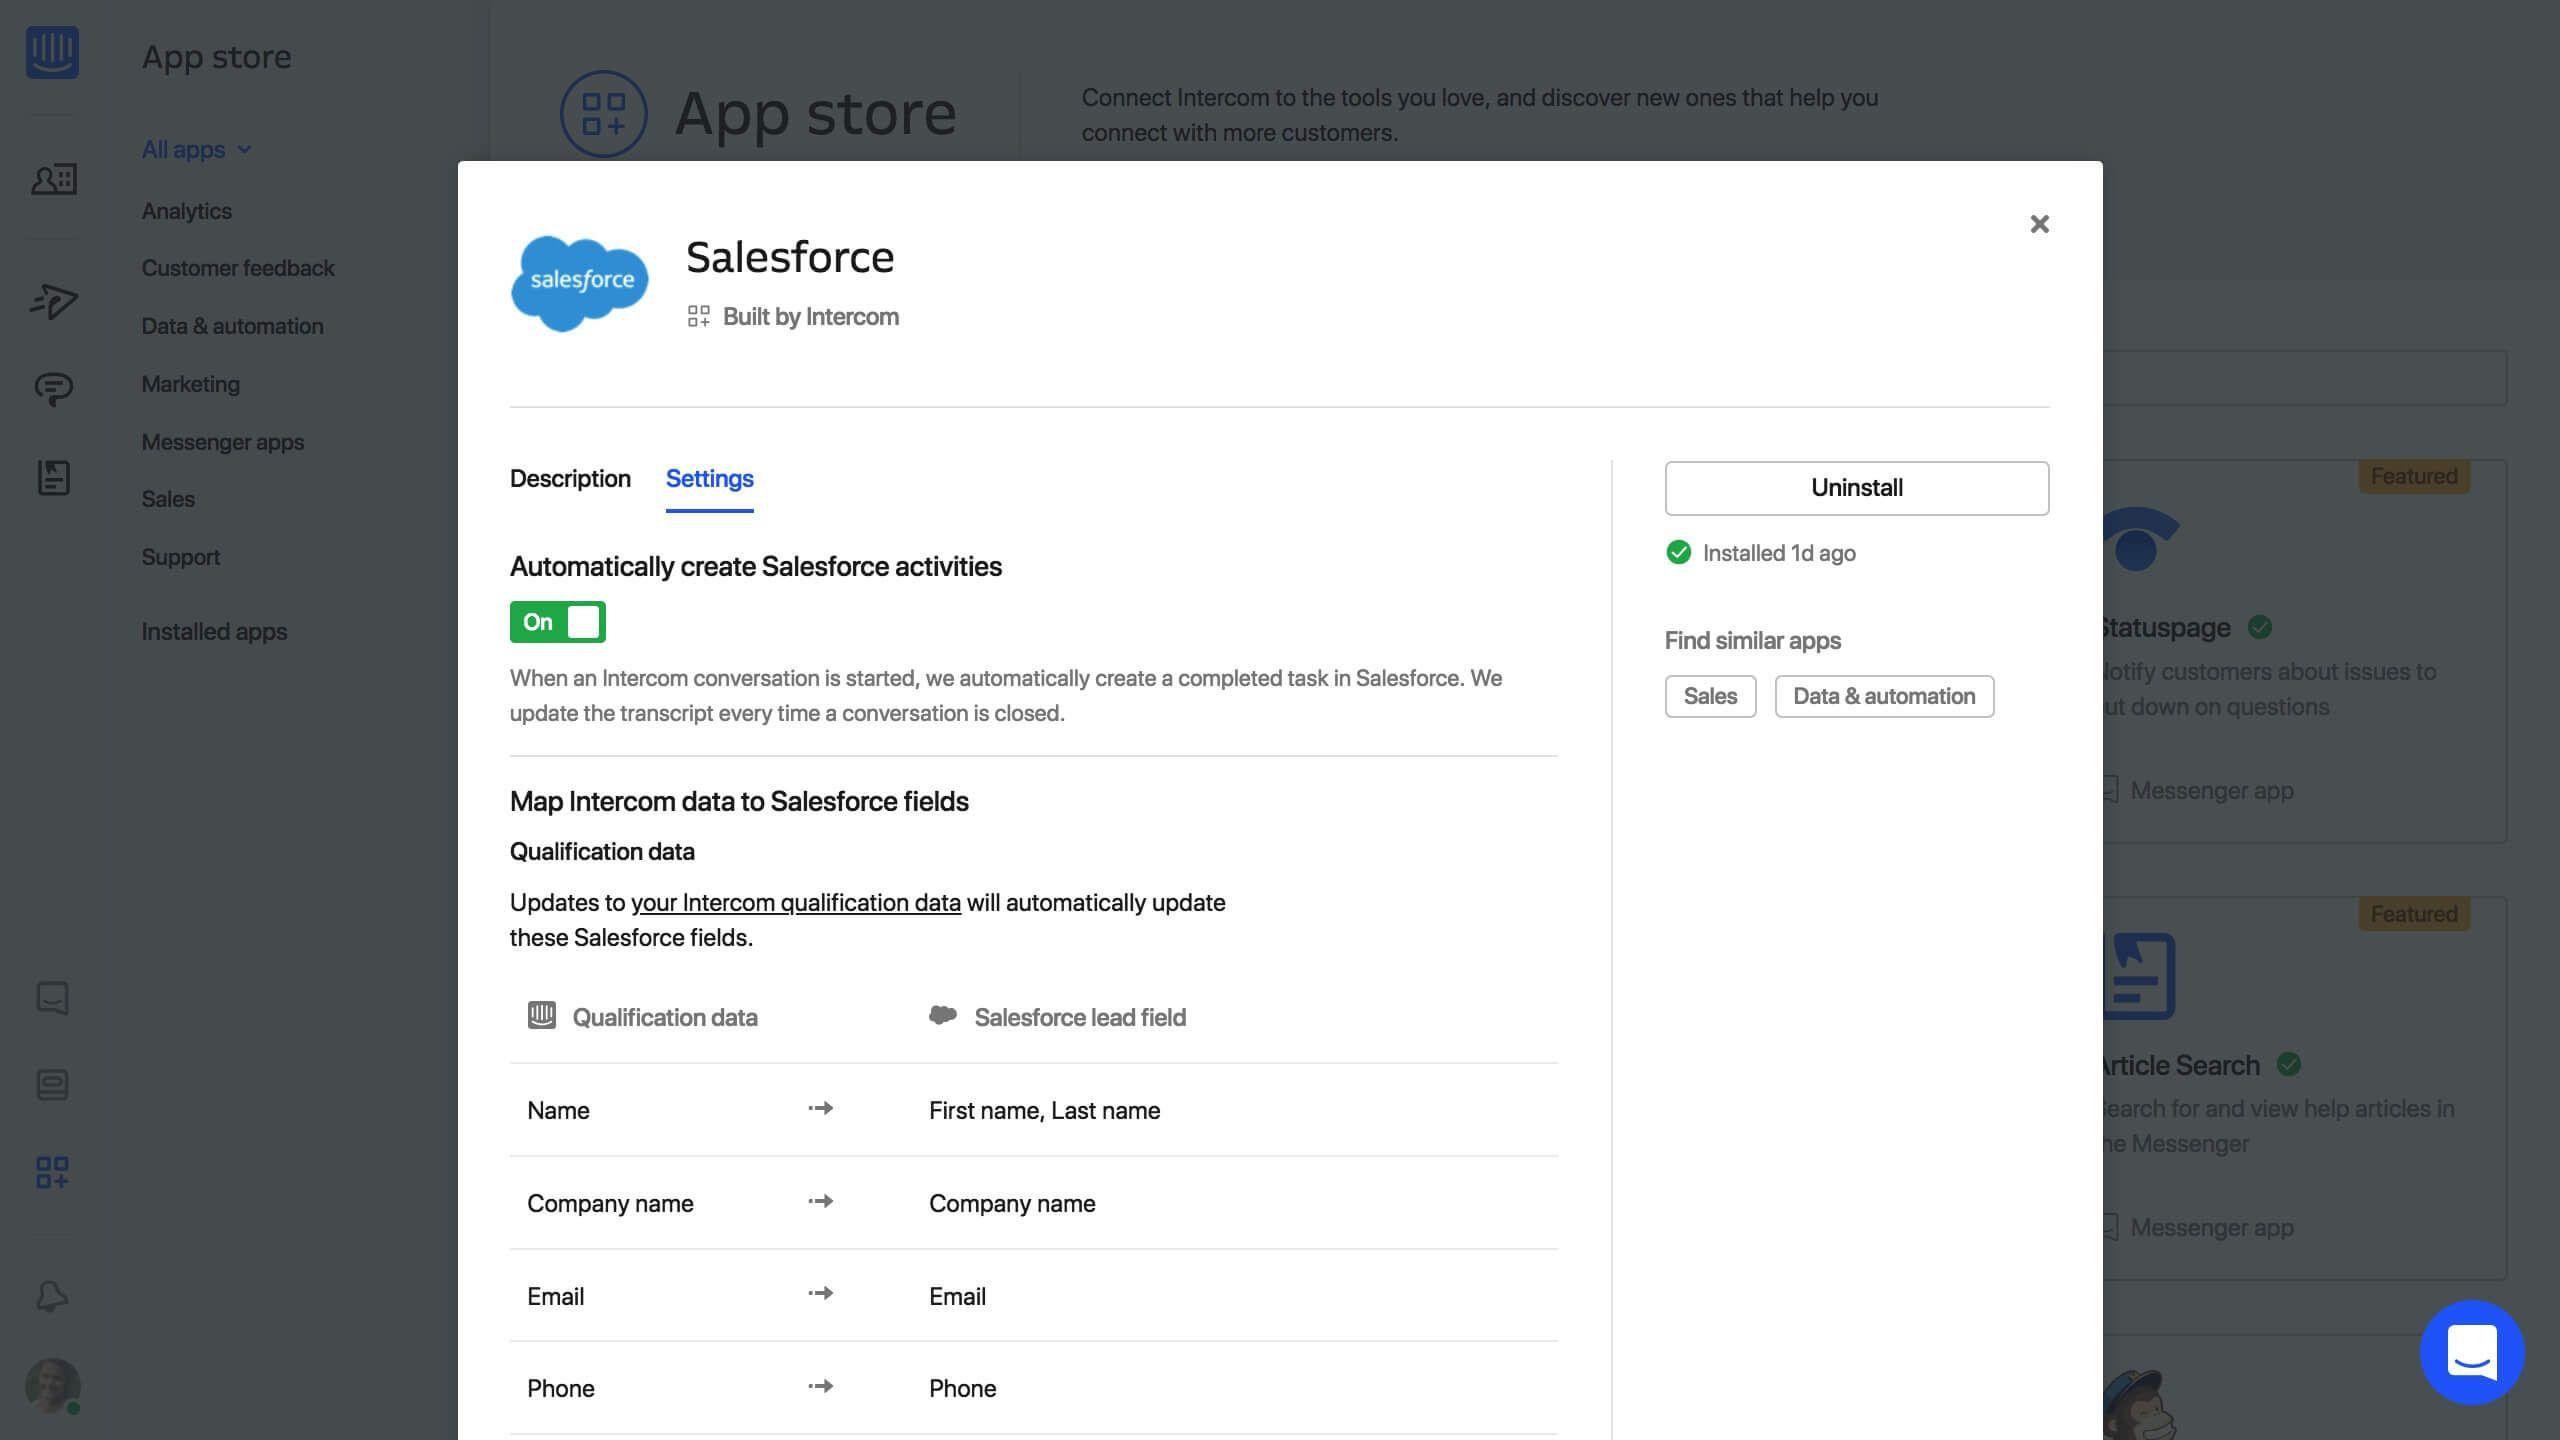 Salesforce App for Intercom